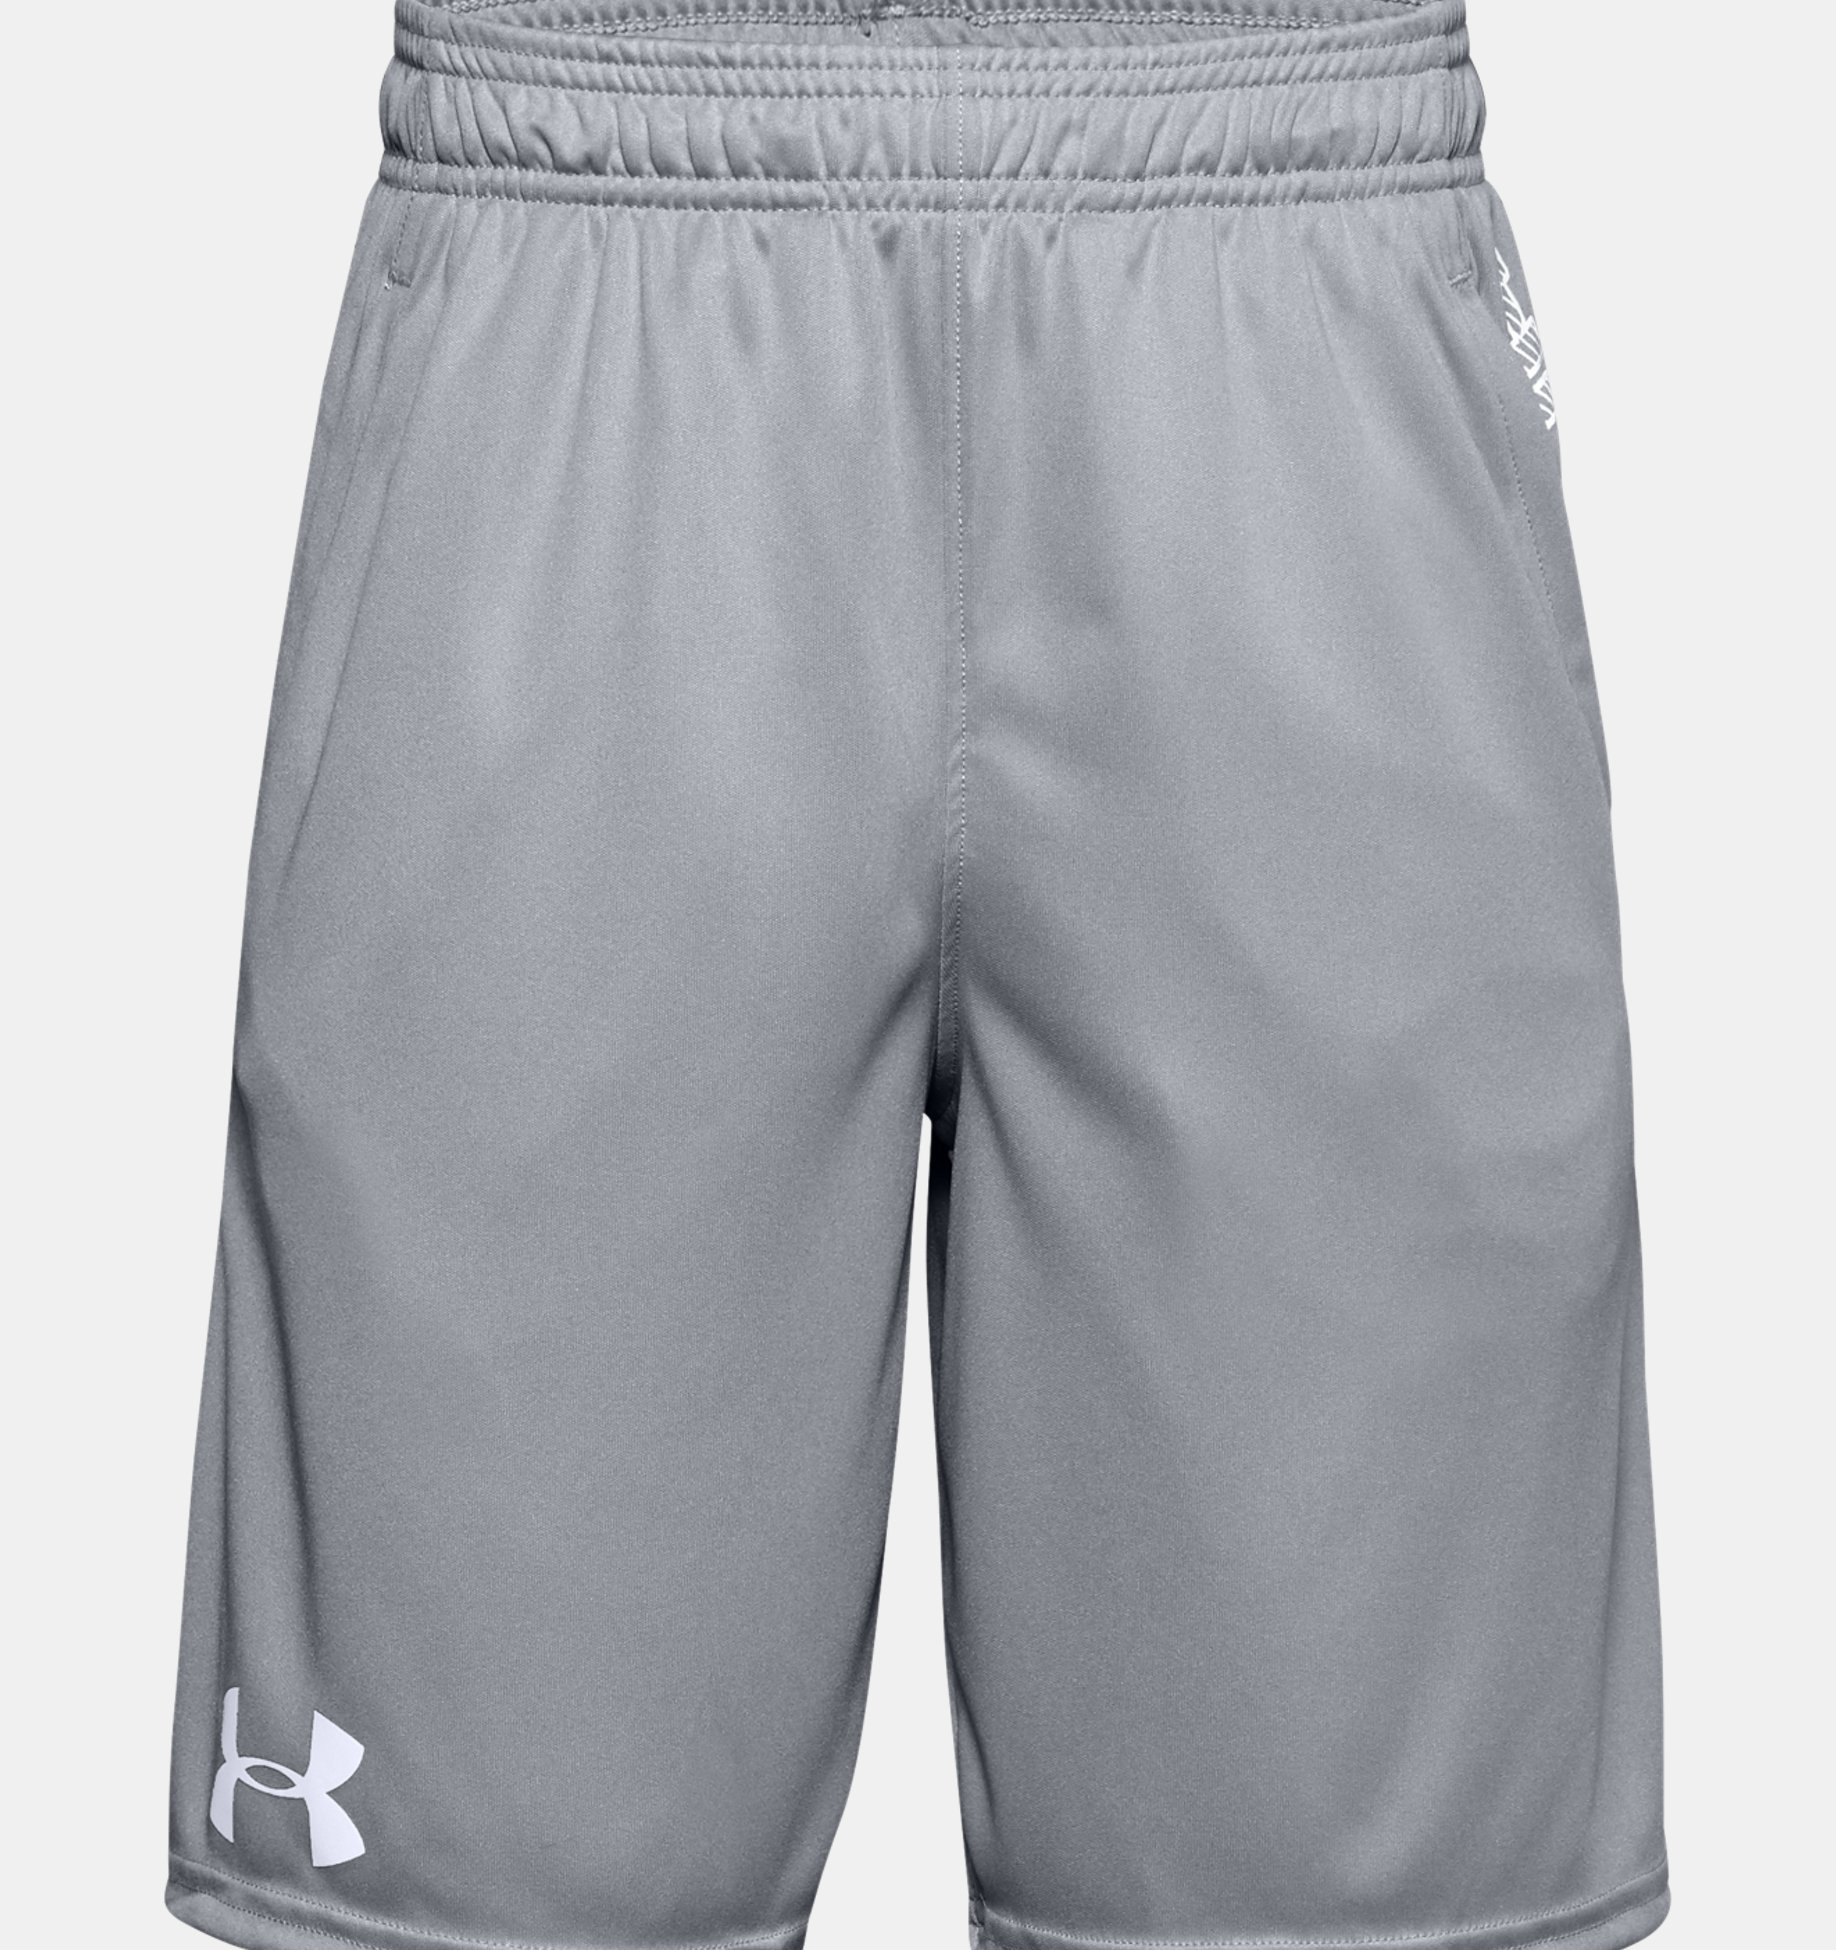 Underarmour Boys UA Velocity Shorts